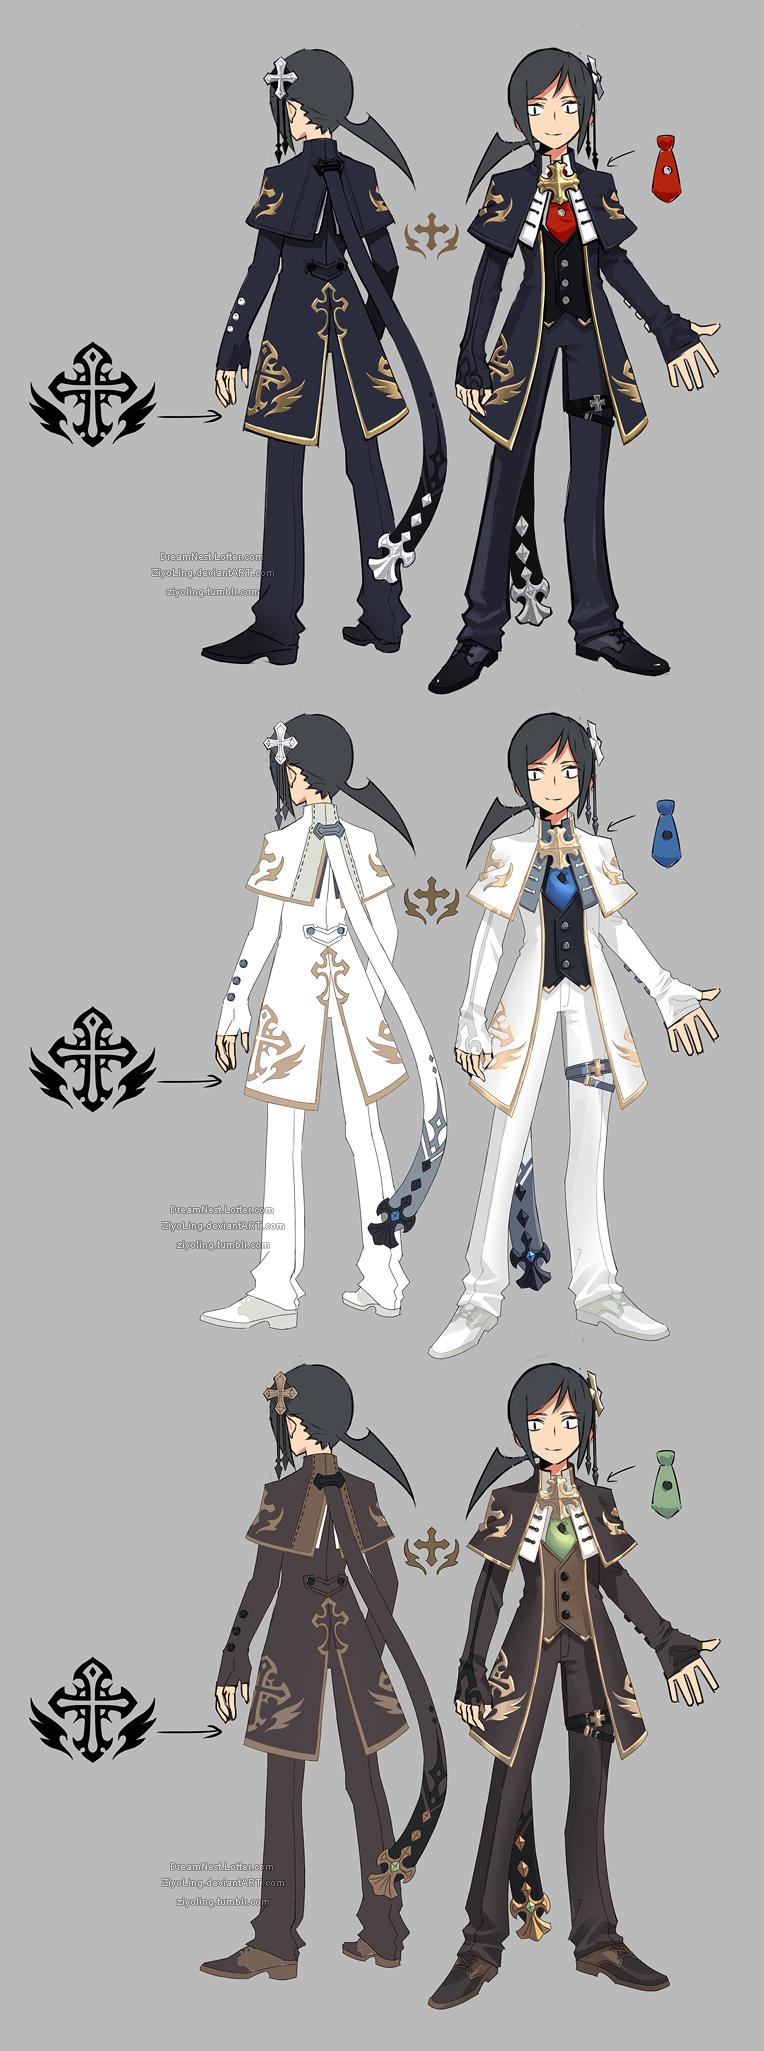 Dragon Nest Priest Assassin By Ziyoling On Deviantart